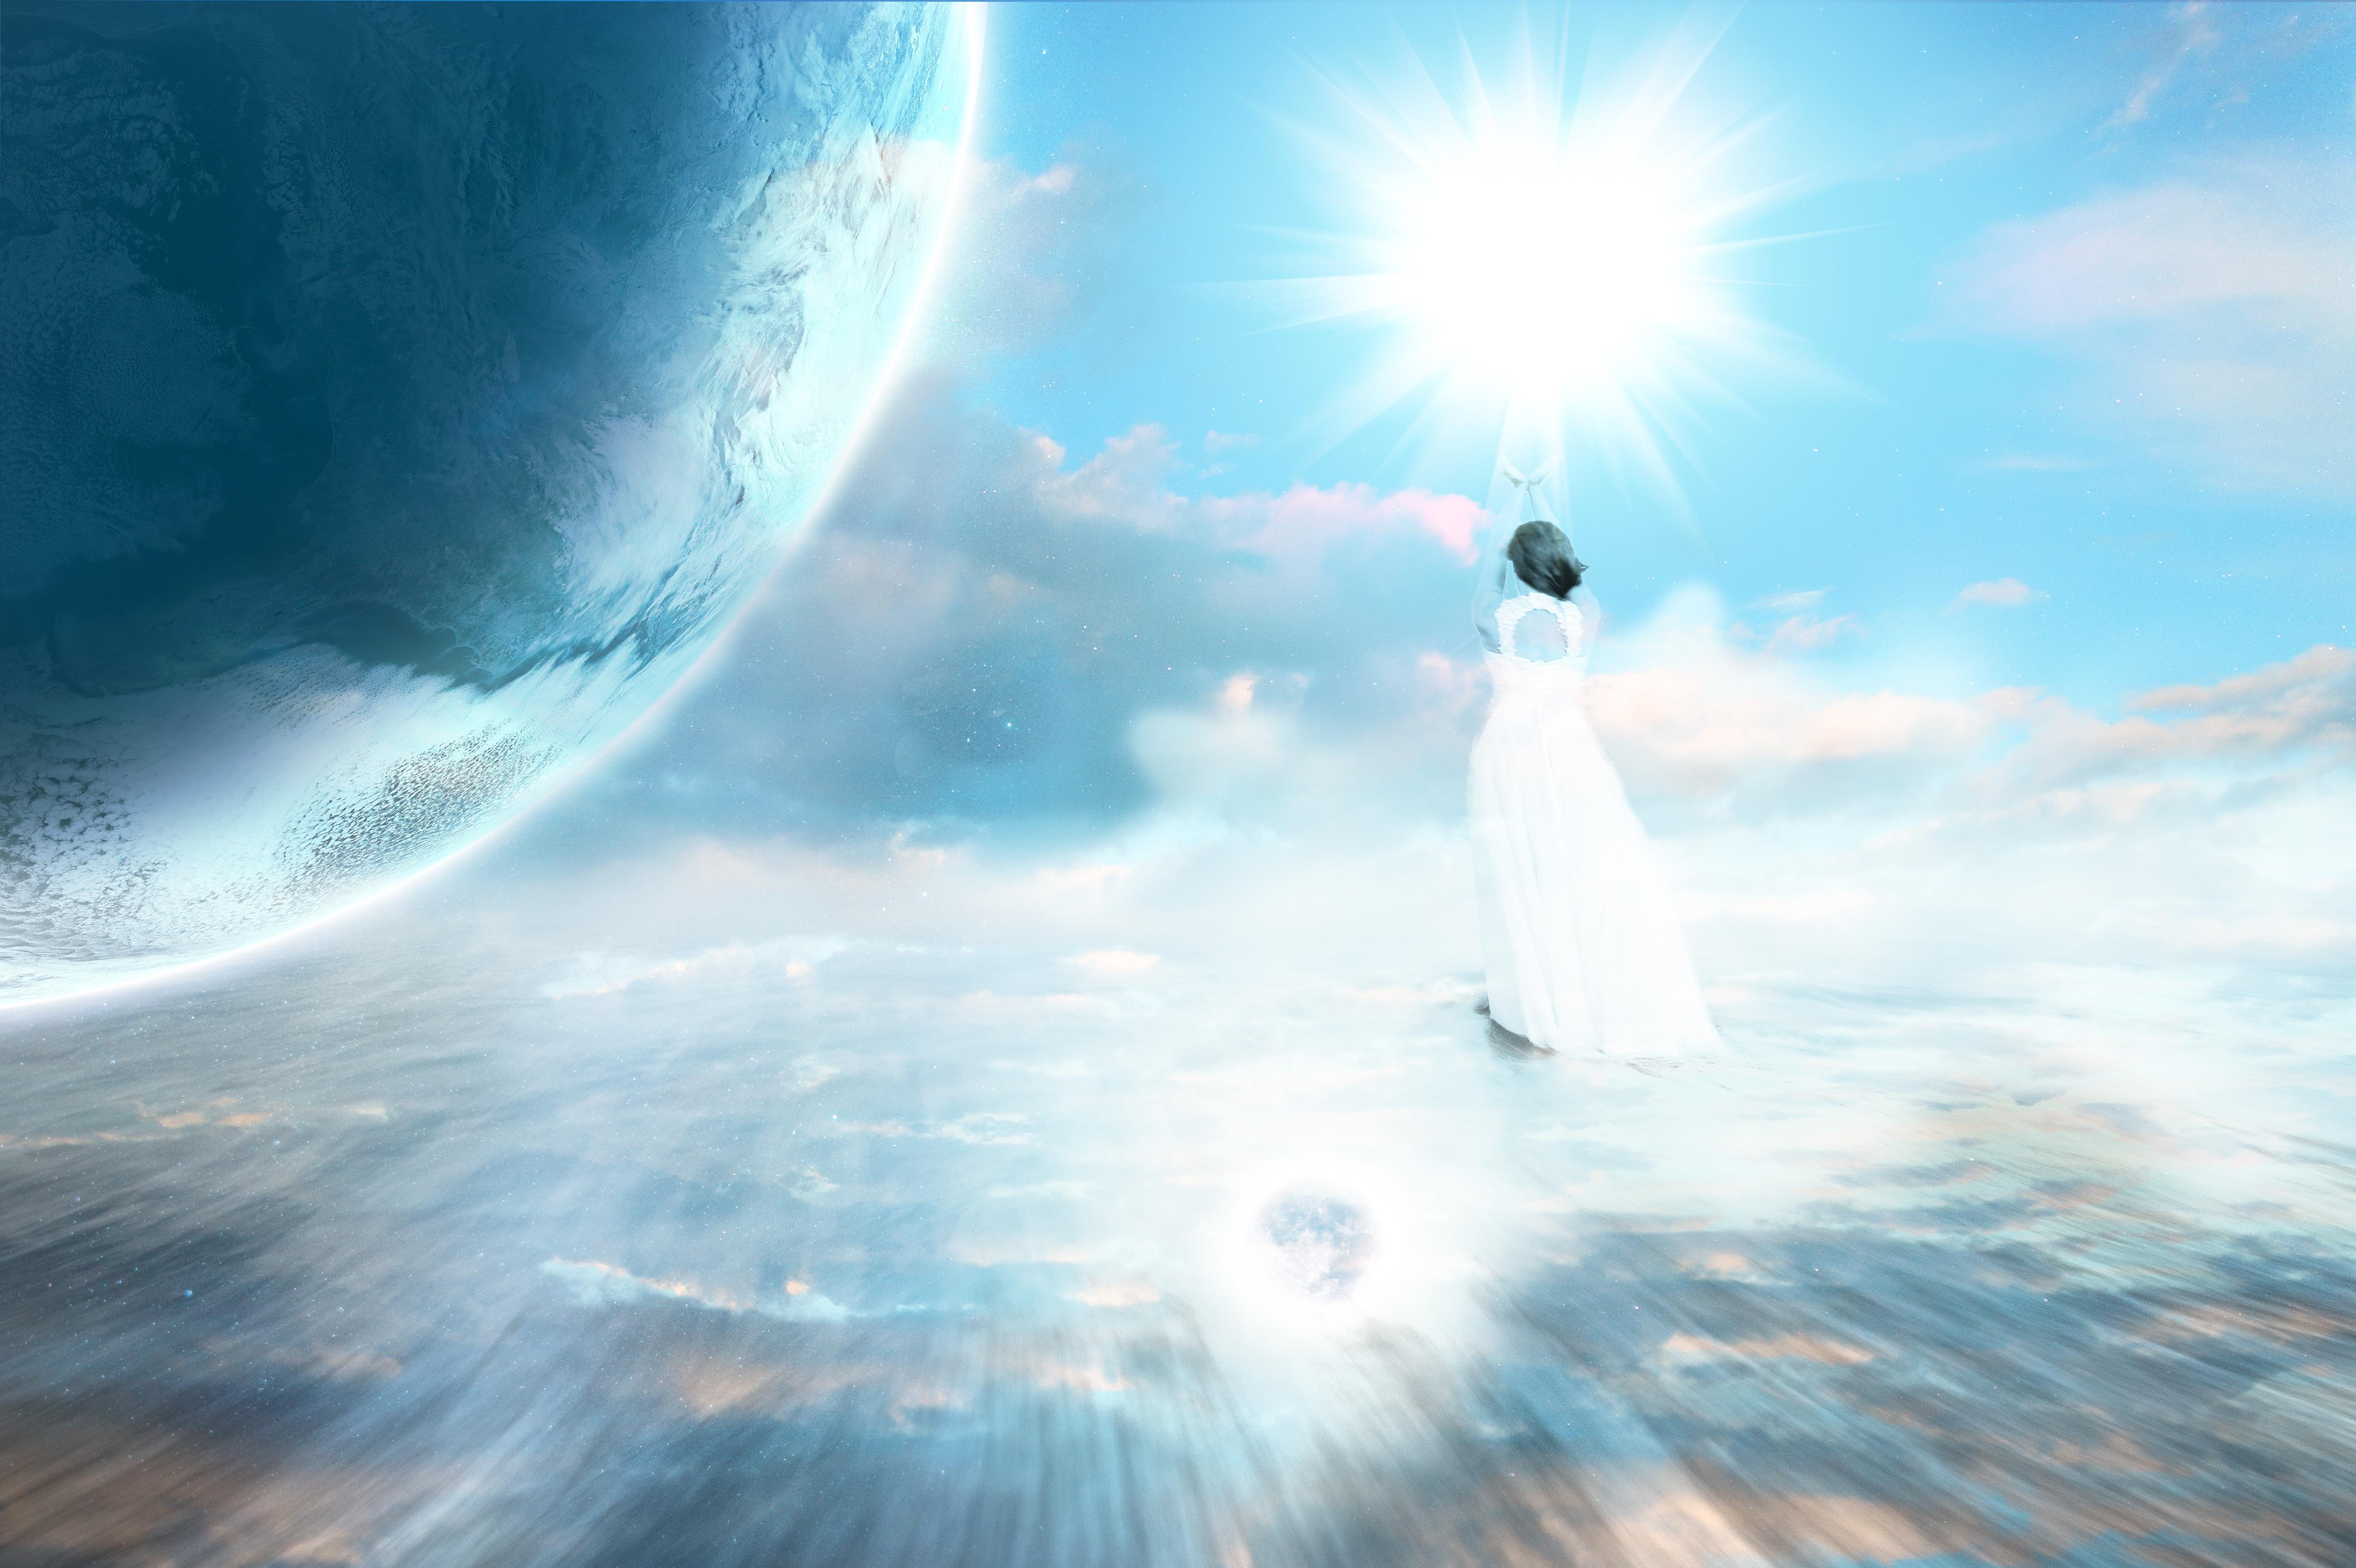 Unduh 1000 Wallpaper Cahaya Allah HD Paling Keren